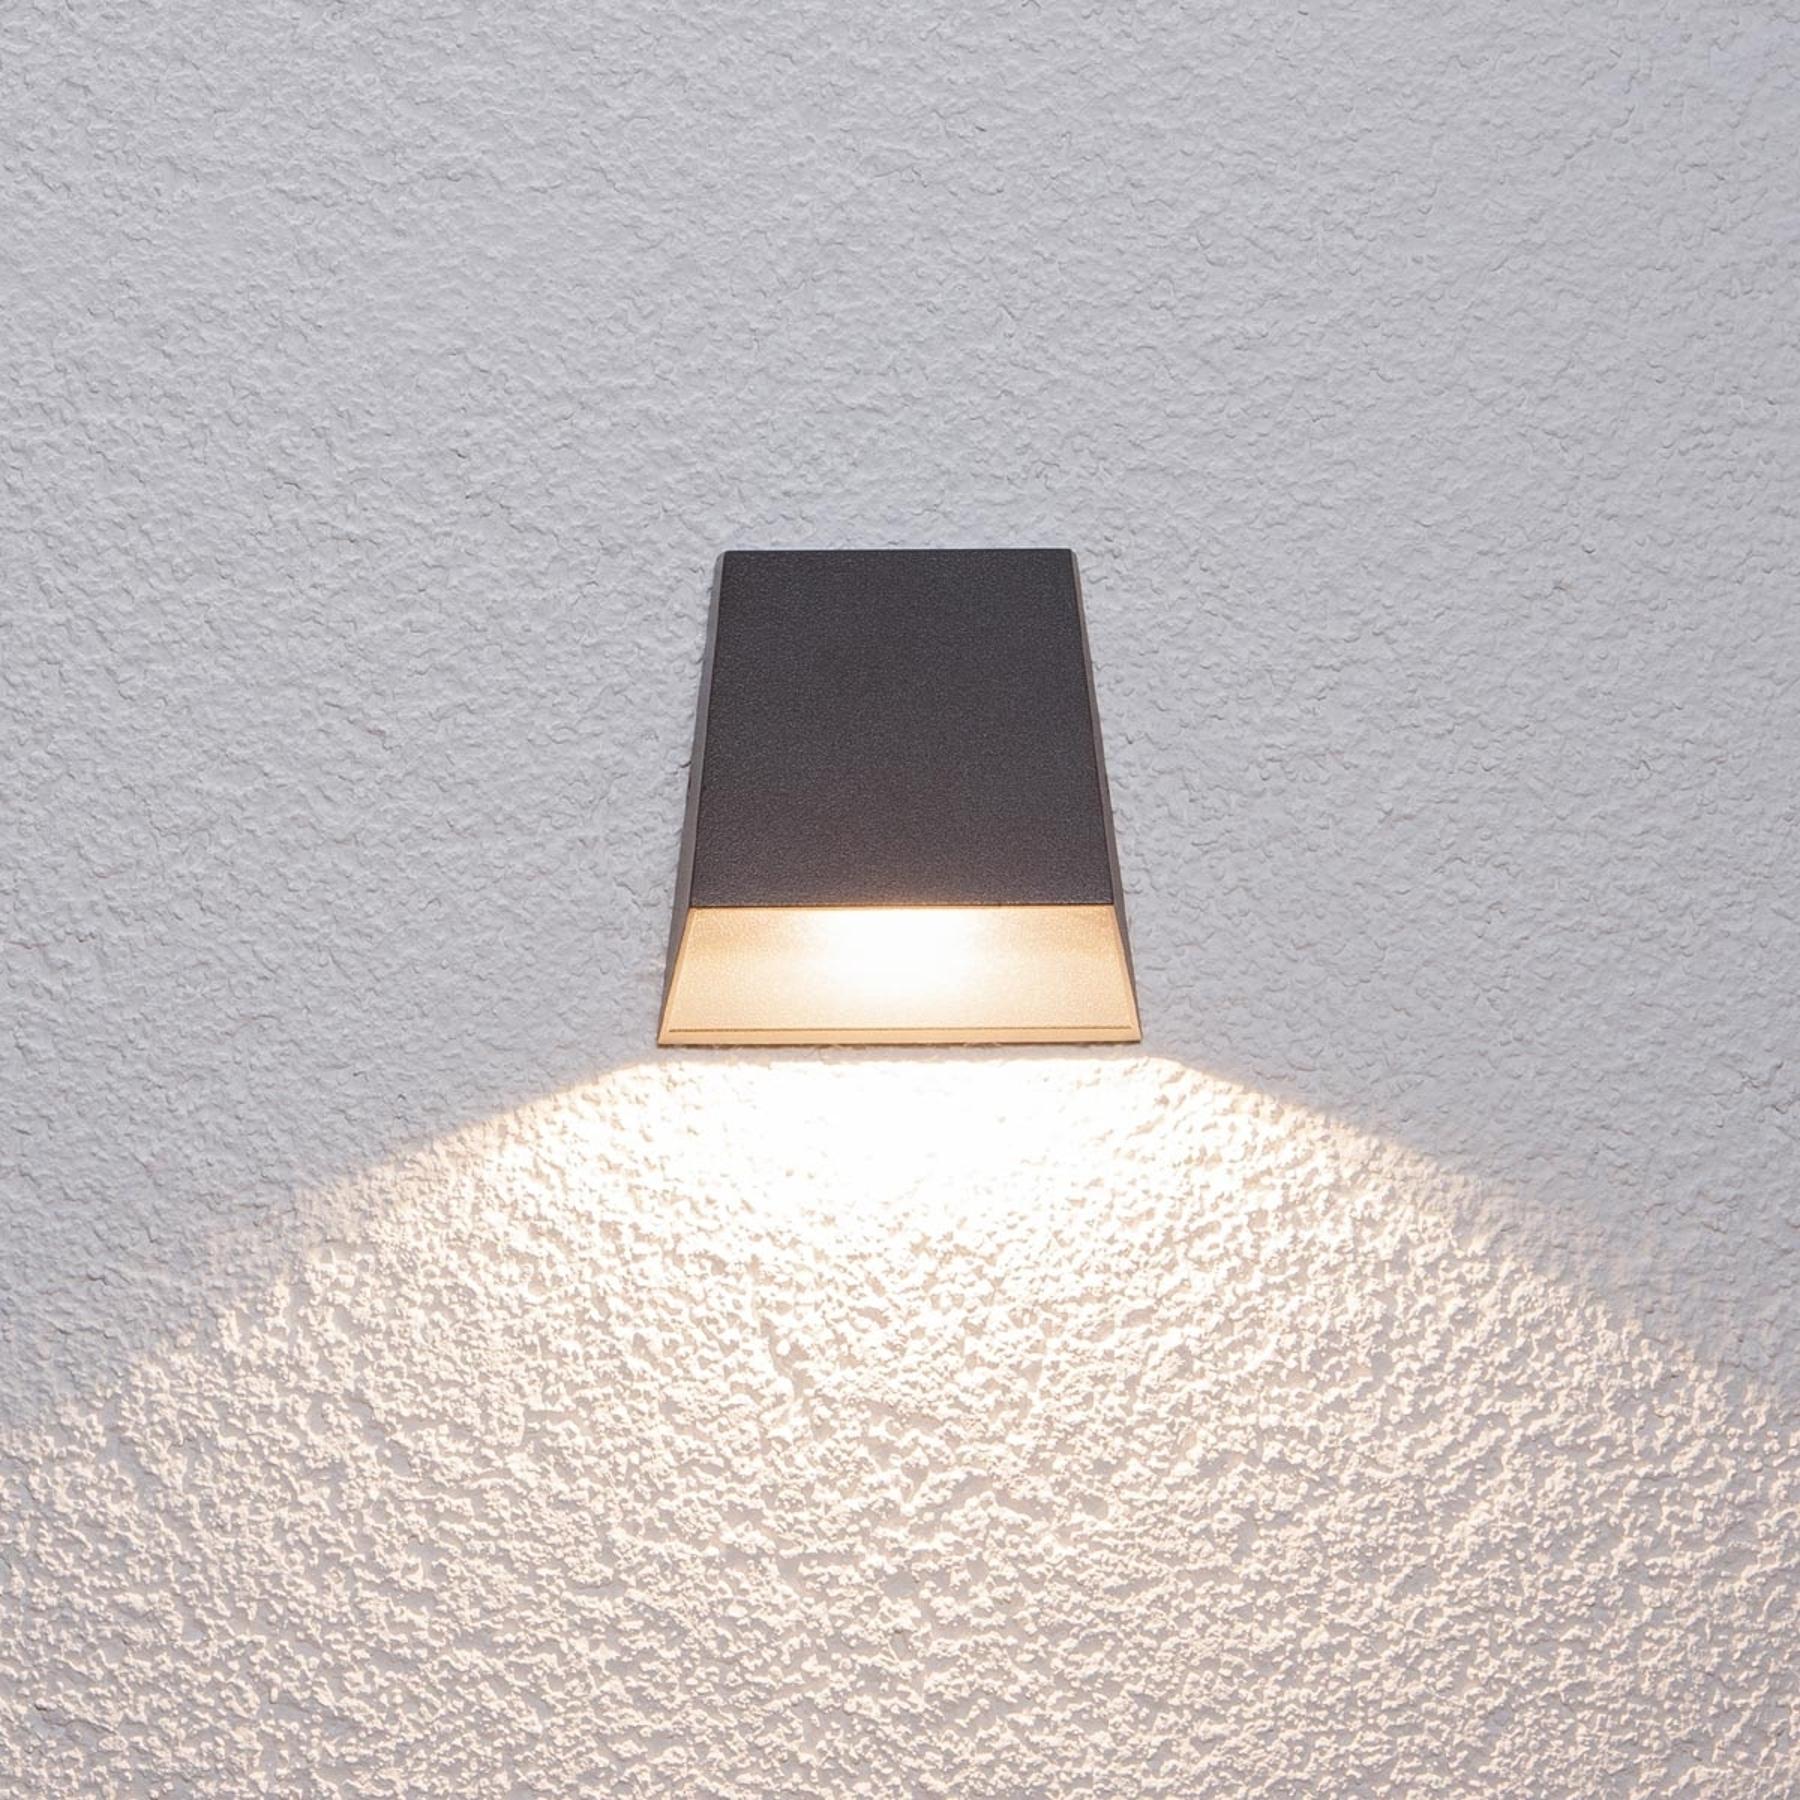 Breedstralende buitenwandlamp Hanno met led